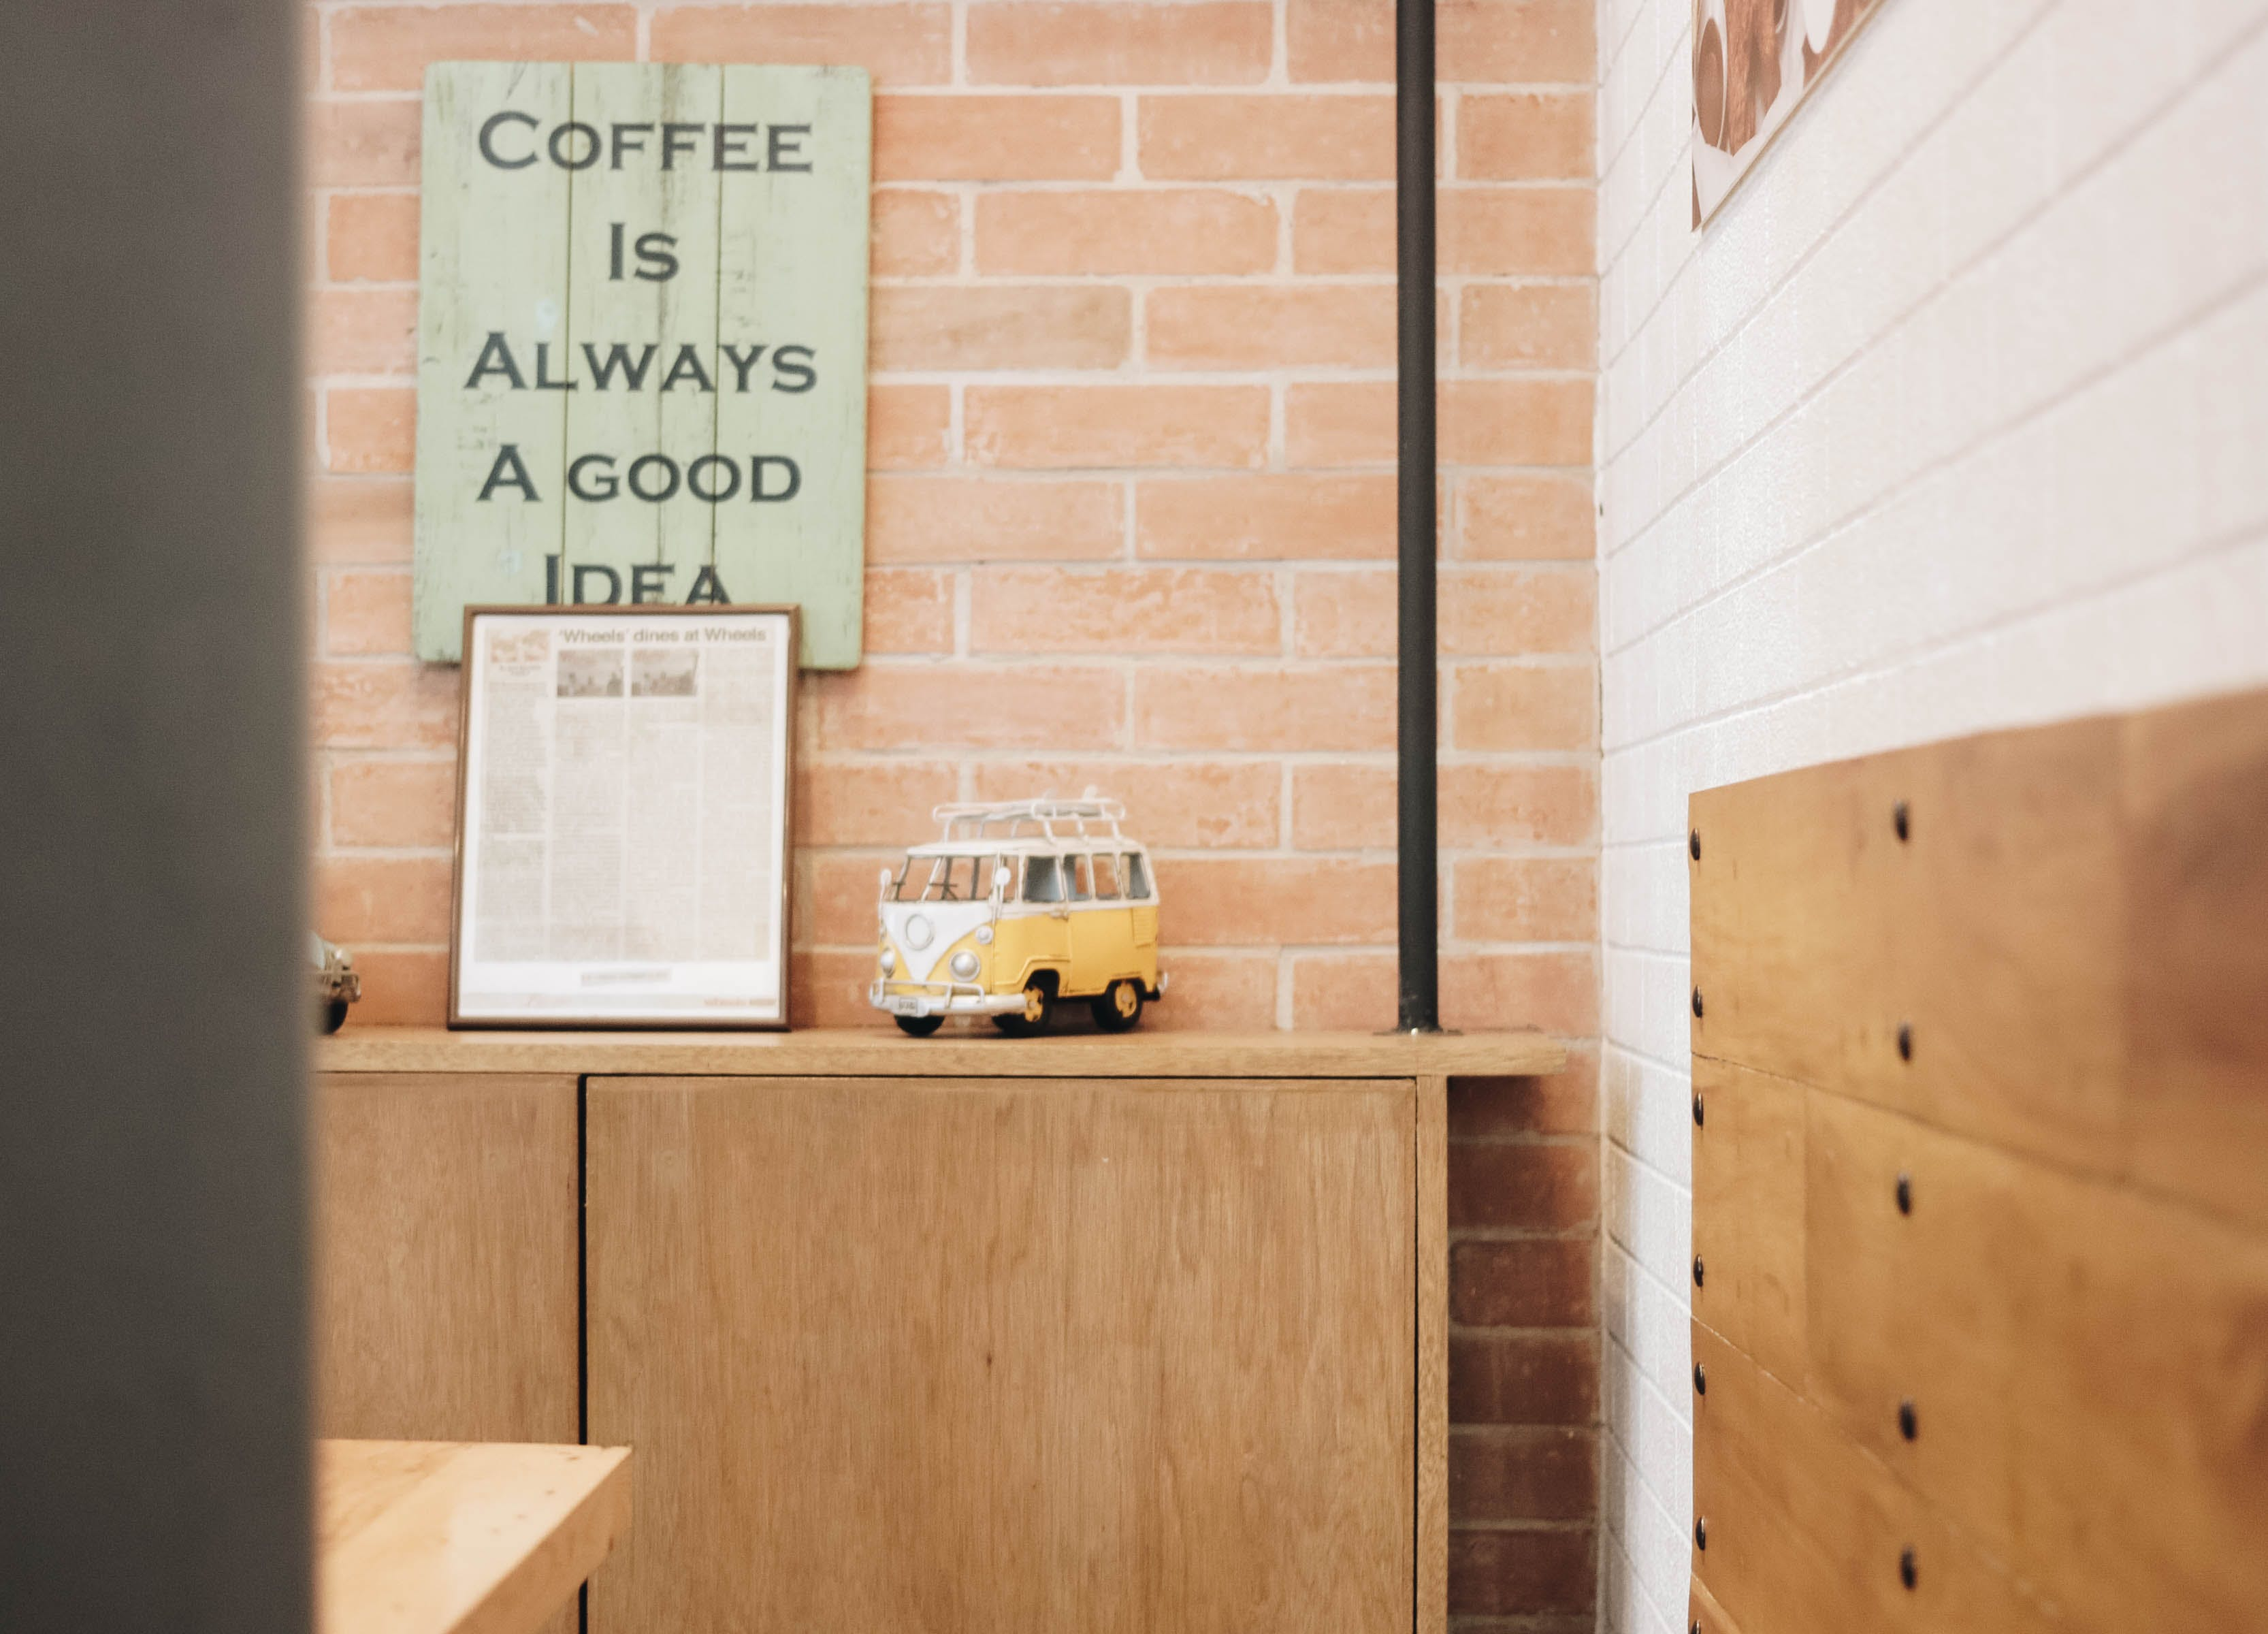 Free stock photo of restaurant, bricks, quote, cafeteria